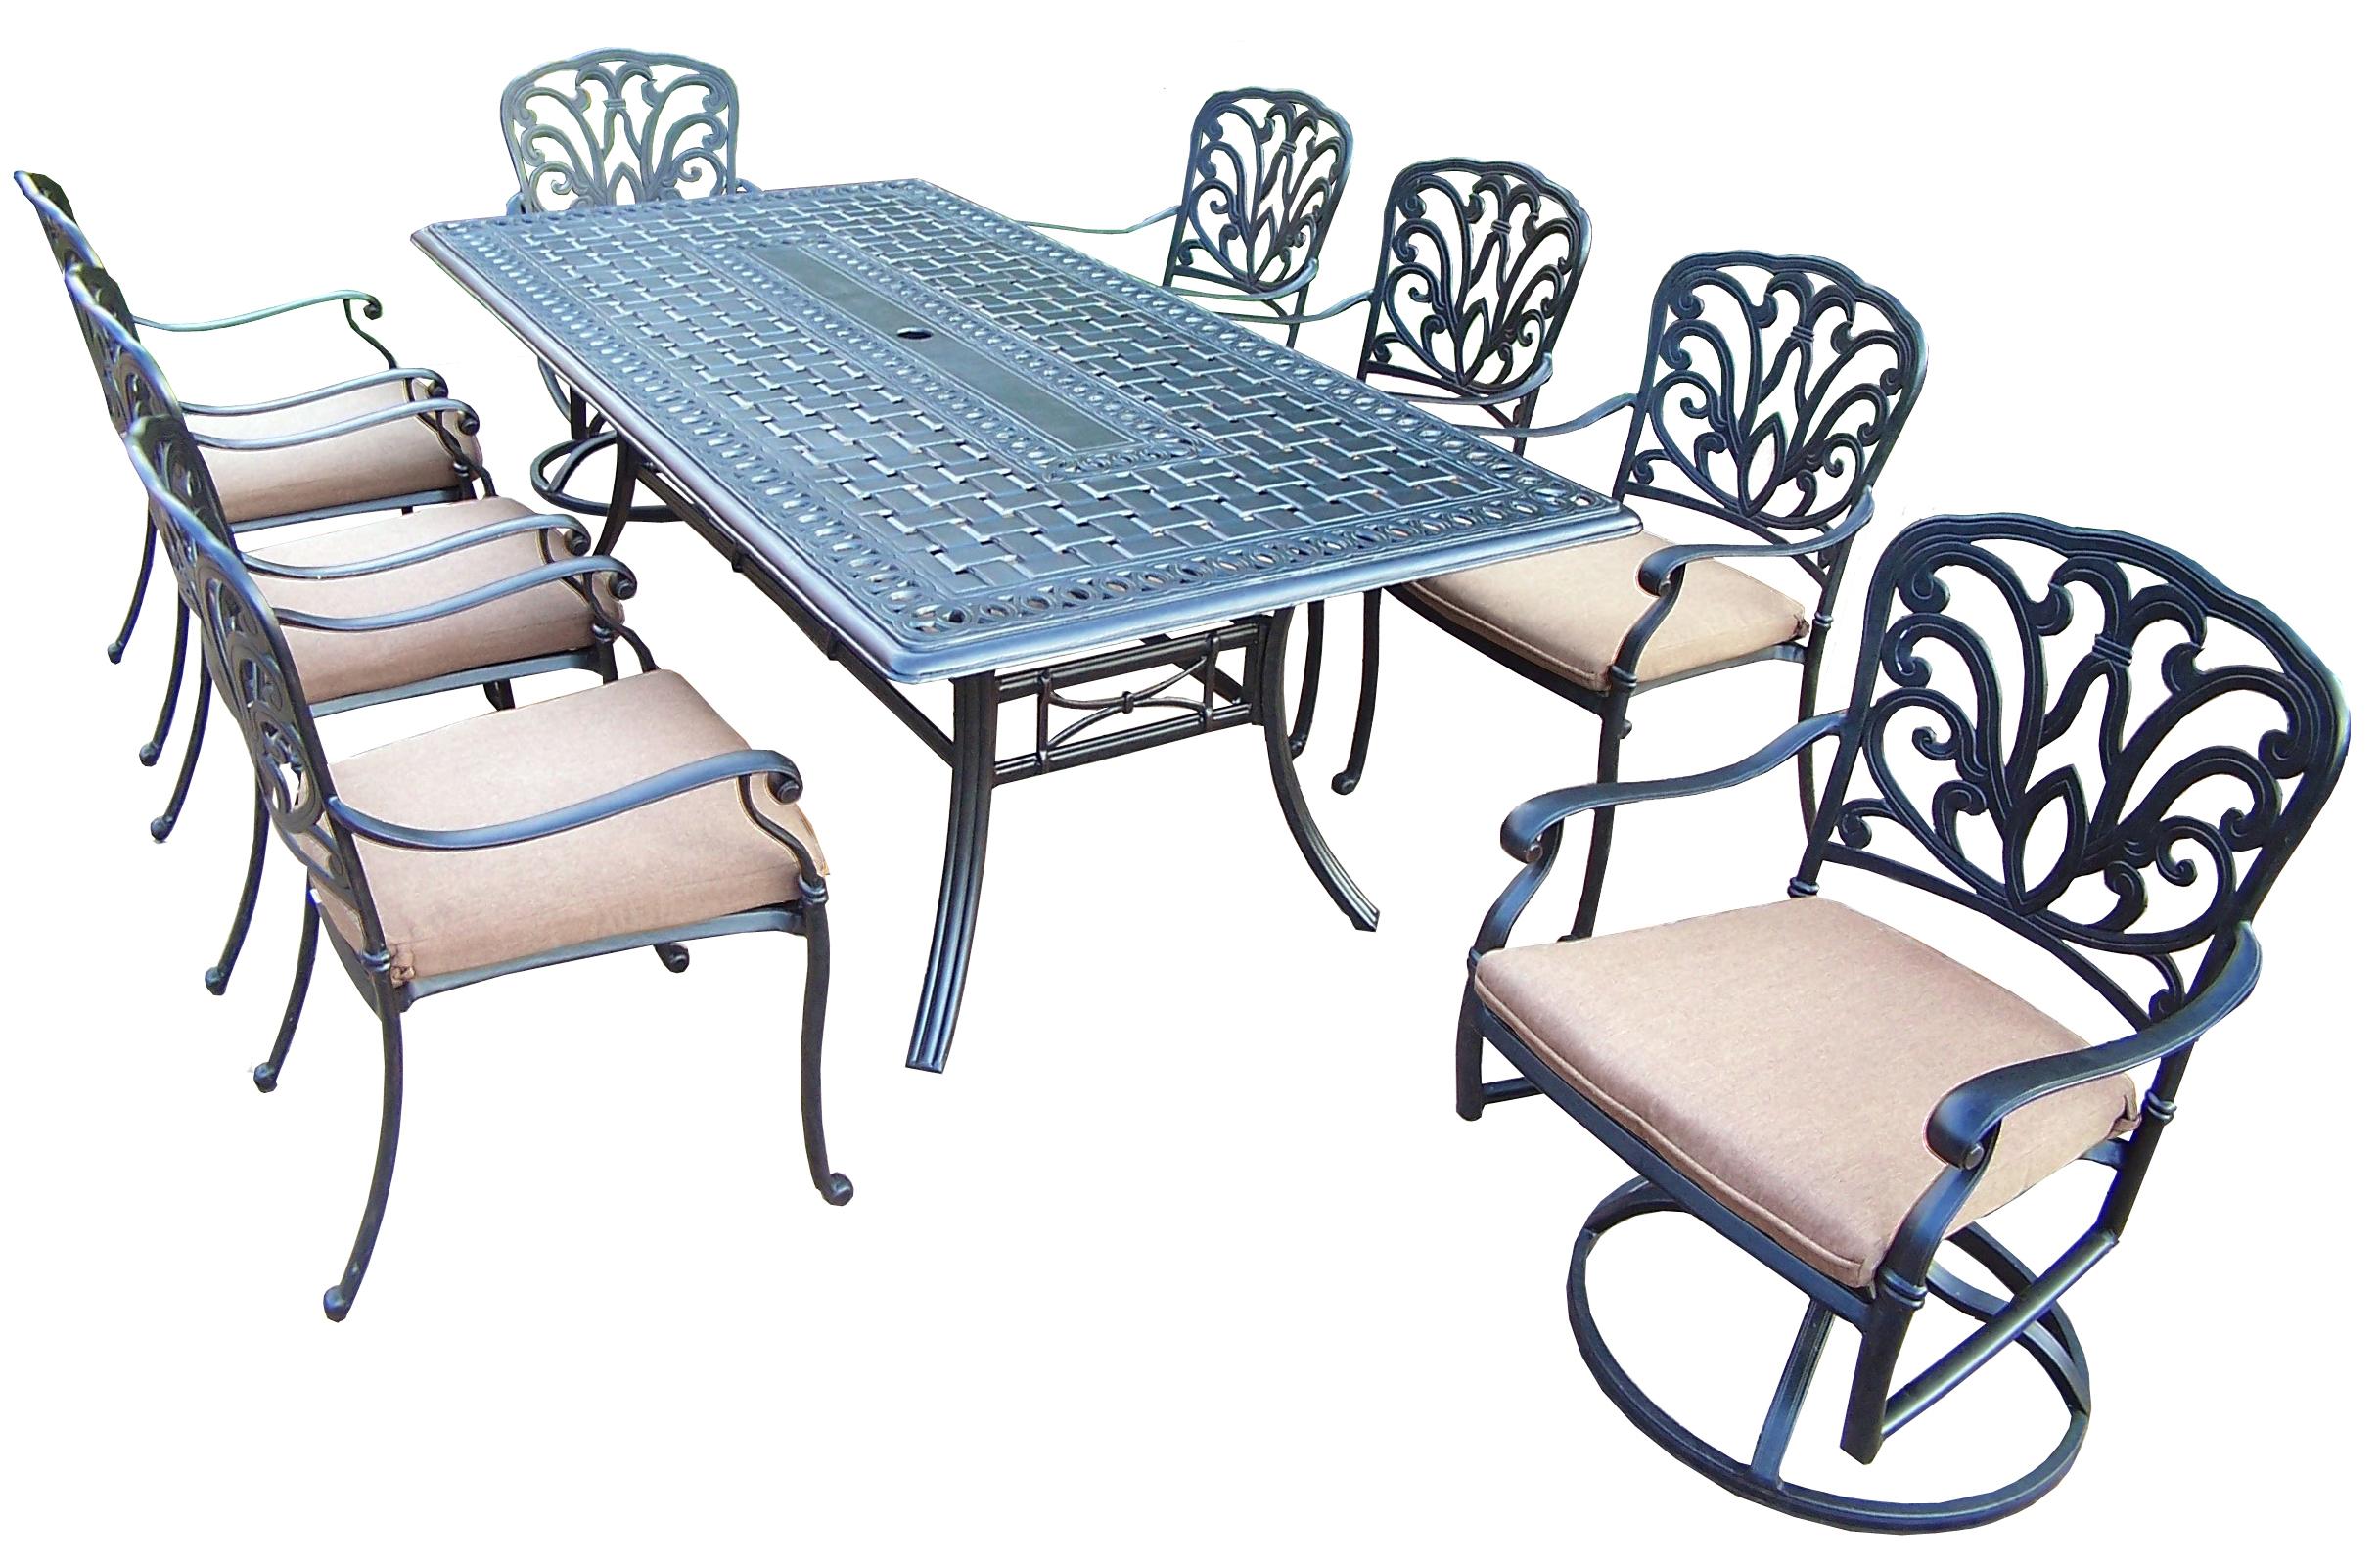 hampton bay swivel patio chairs menards chair cushions oakland living 9pc dining set